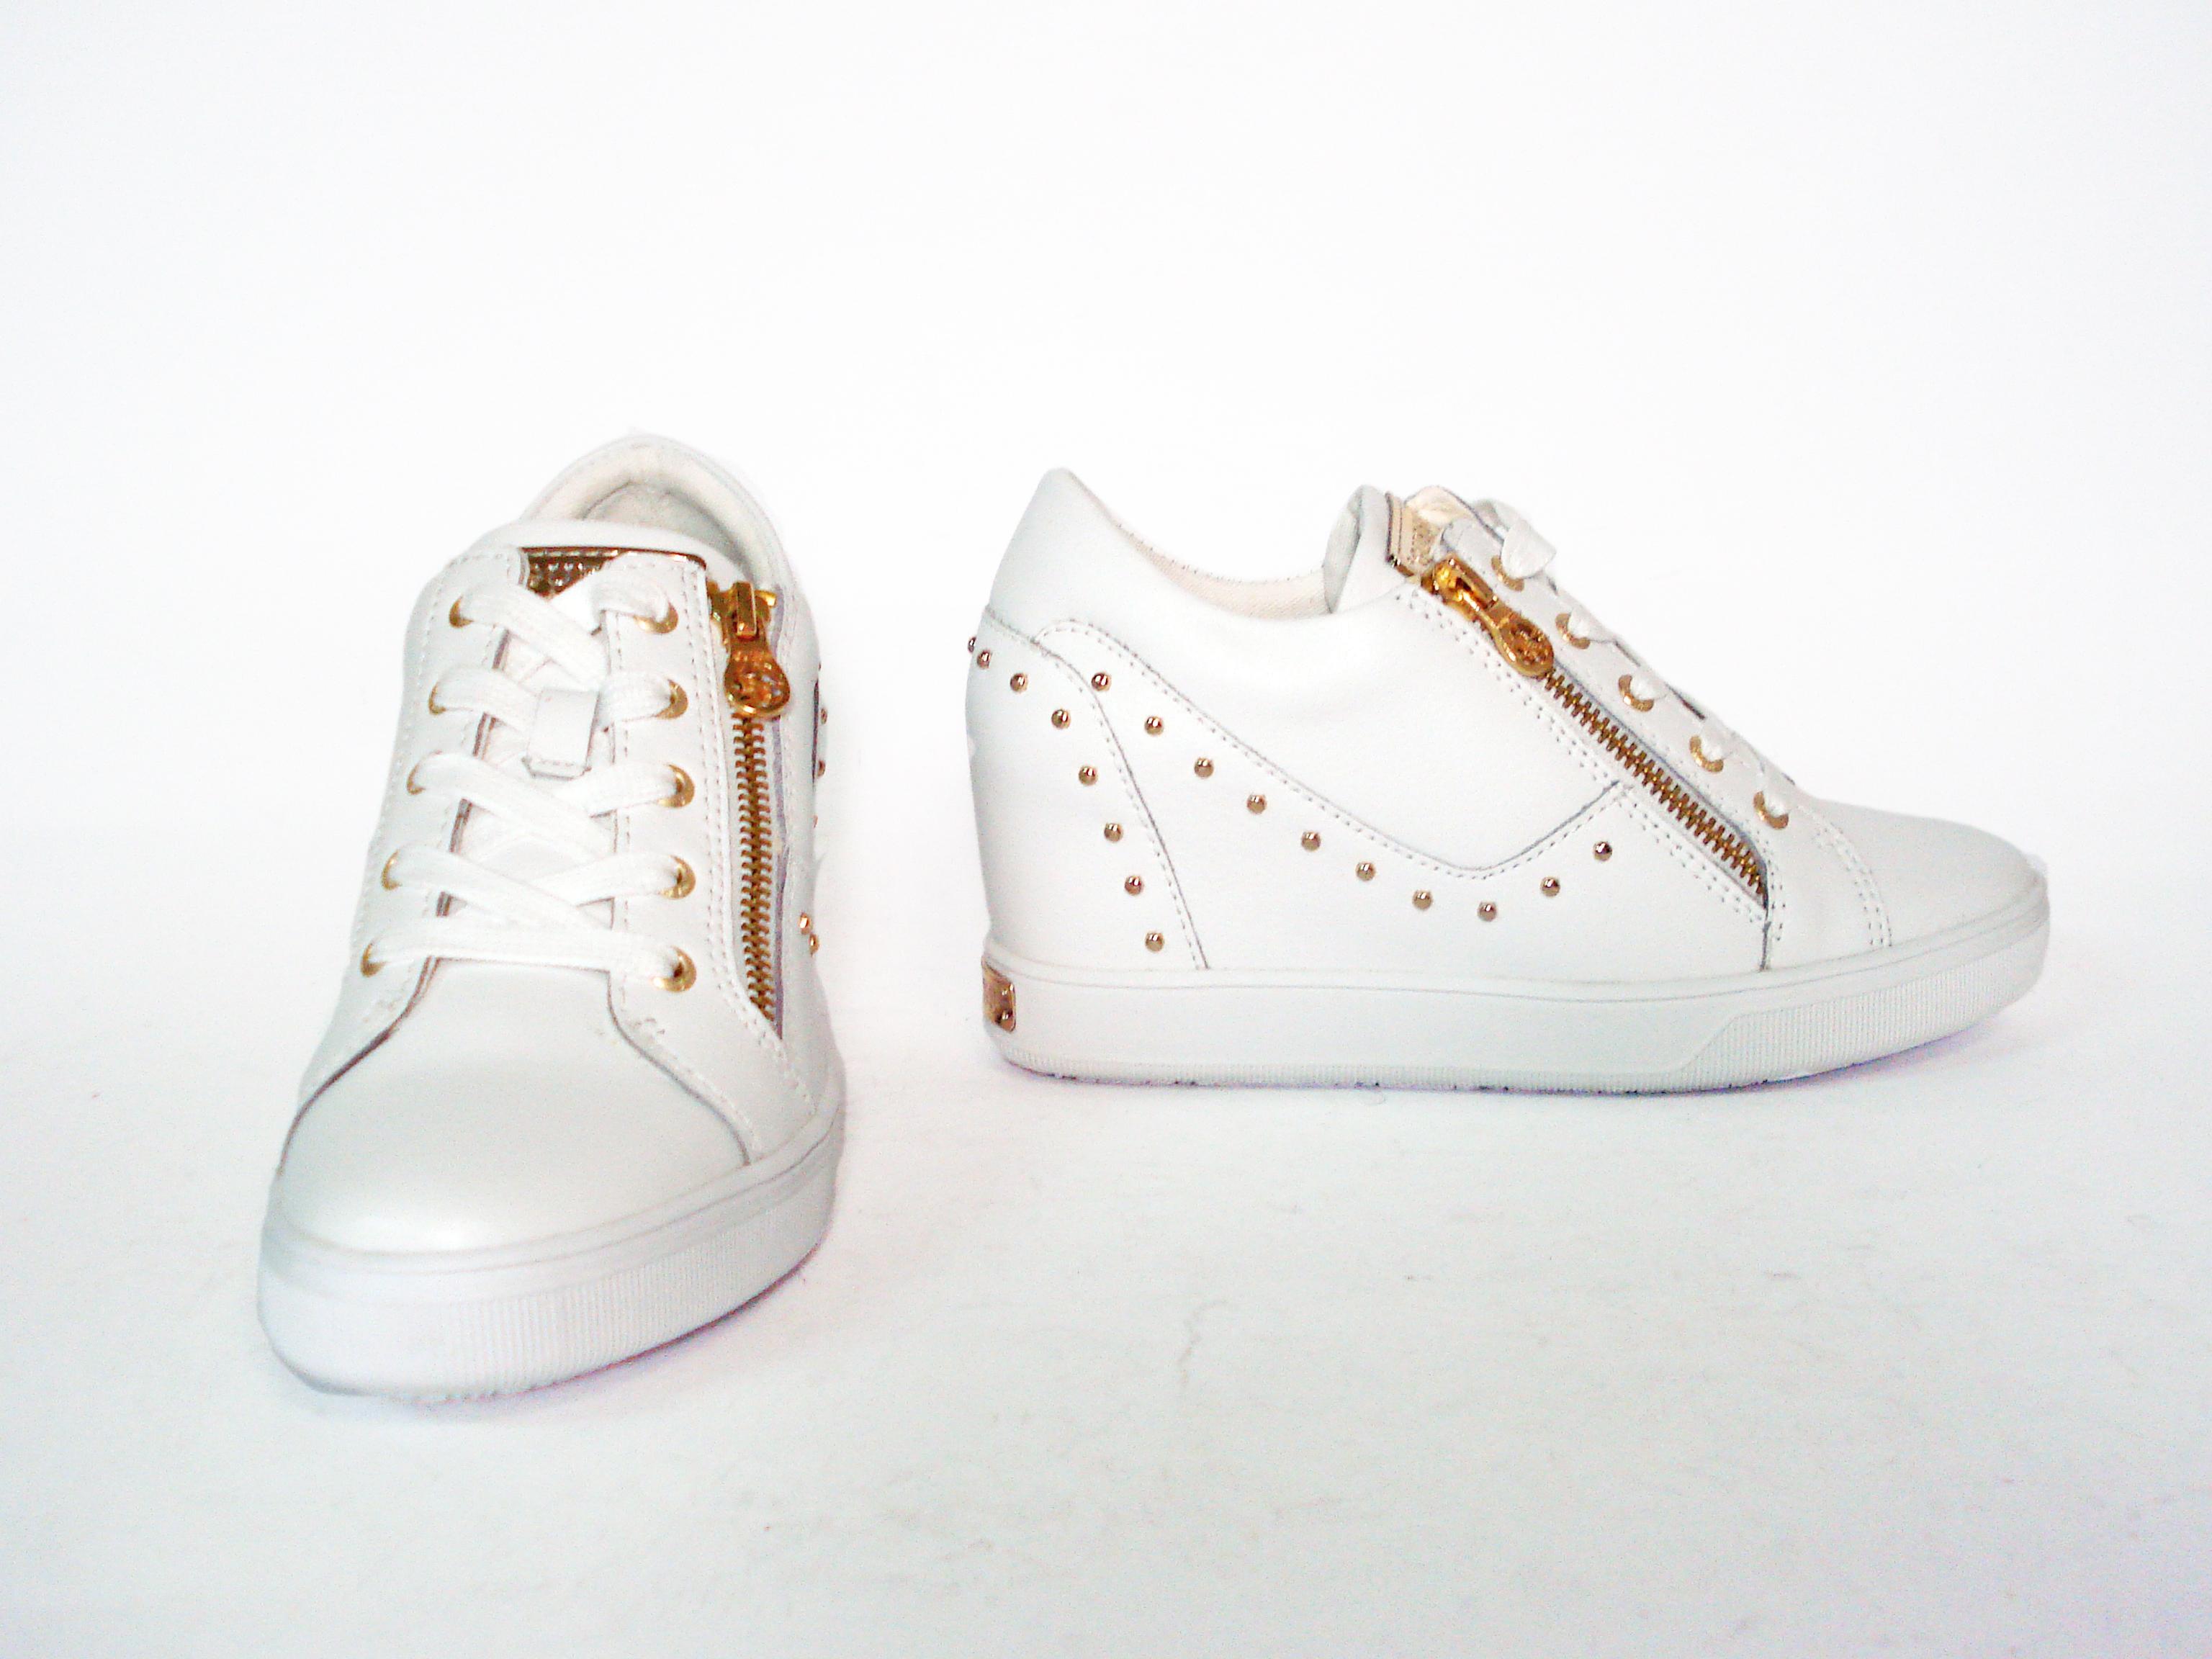 new styles 5a5a5 98e7b Sneaker bianca con zeppa interna Guess